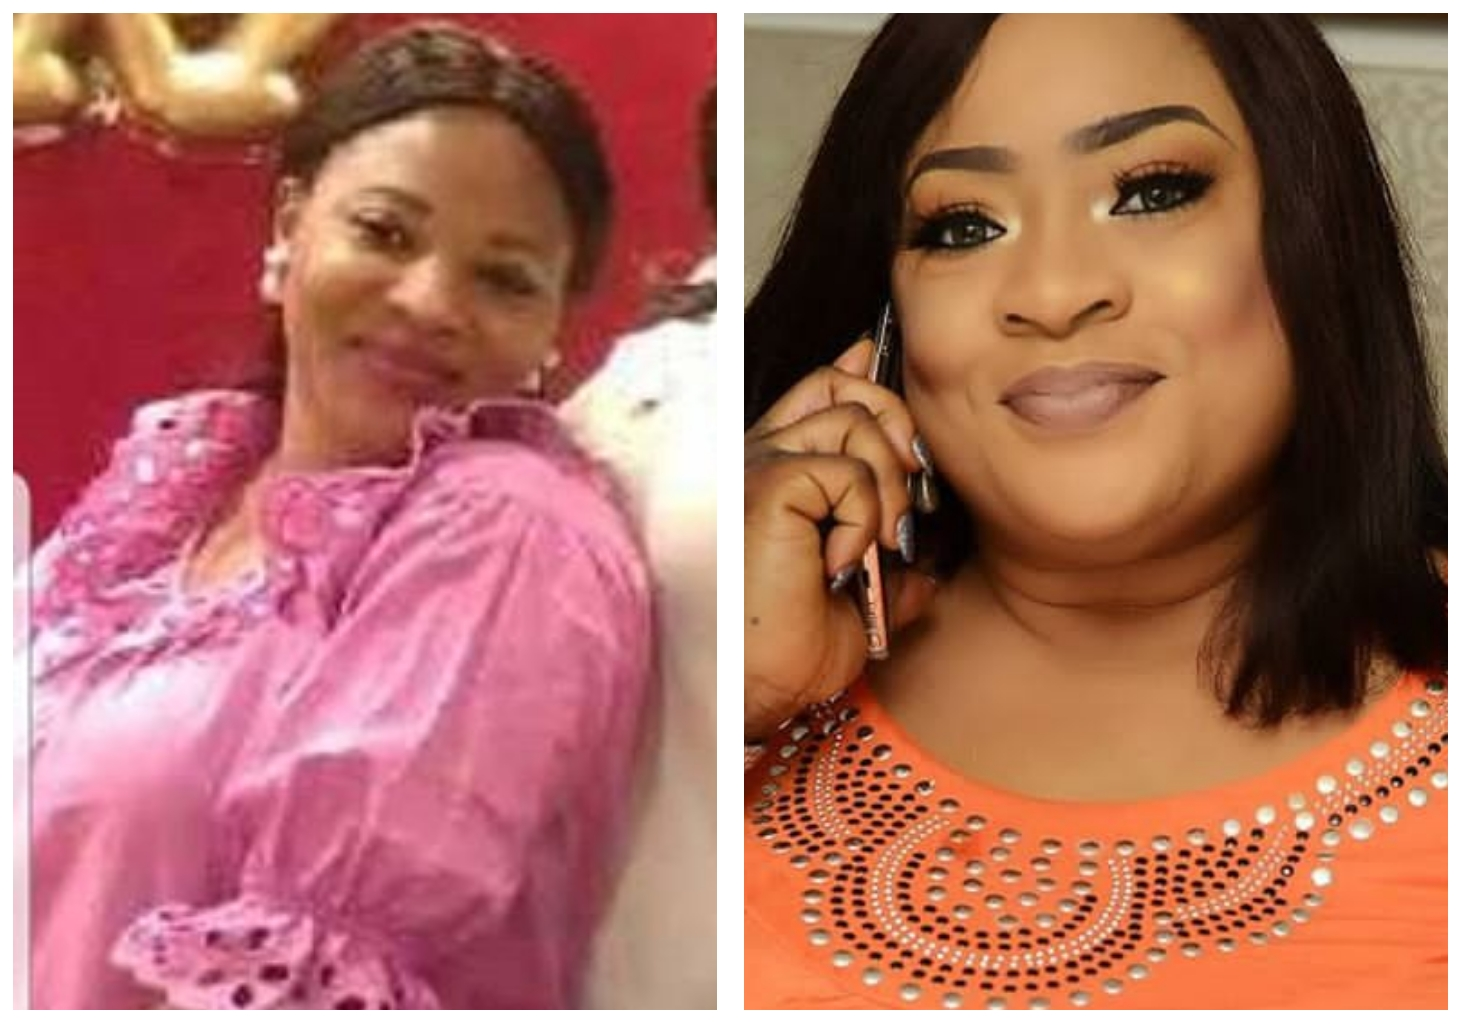 """I miss our friendship"" – Foluke Daramola remembers Actress Moji Olaiya who died 3 years ago (Photos)"